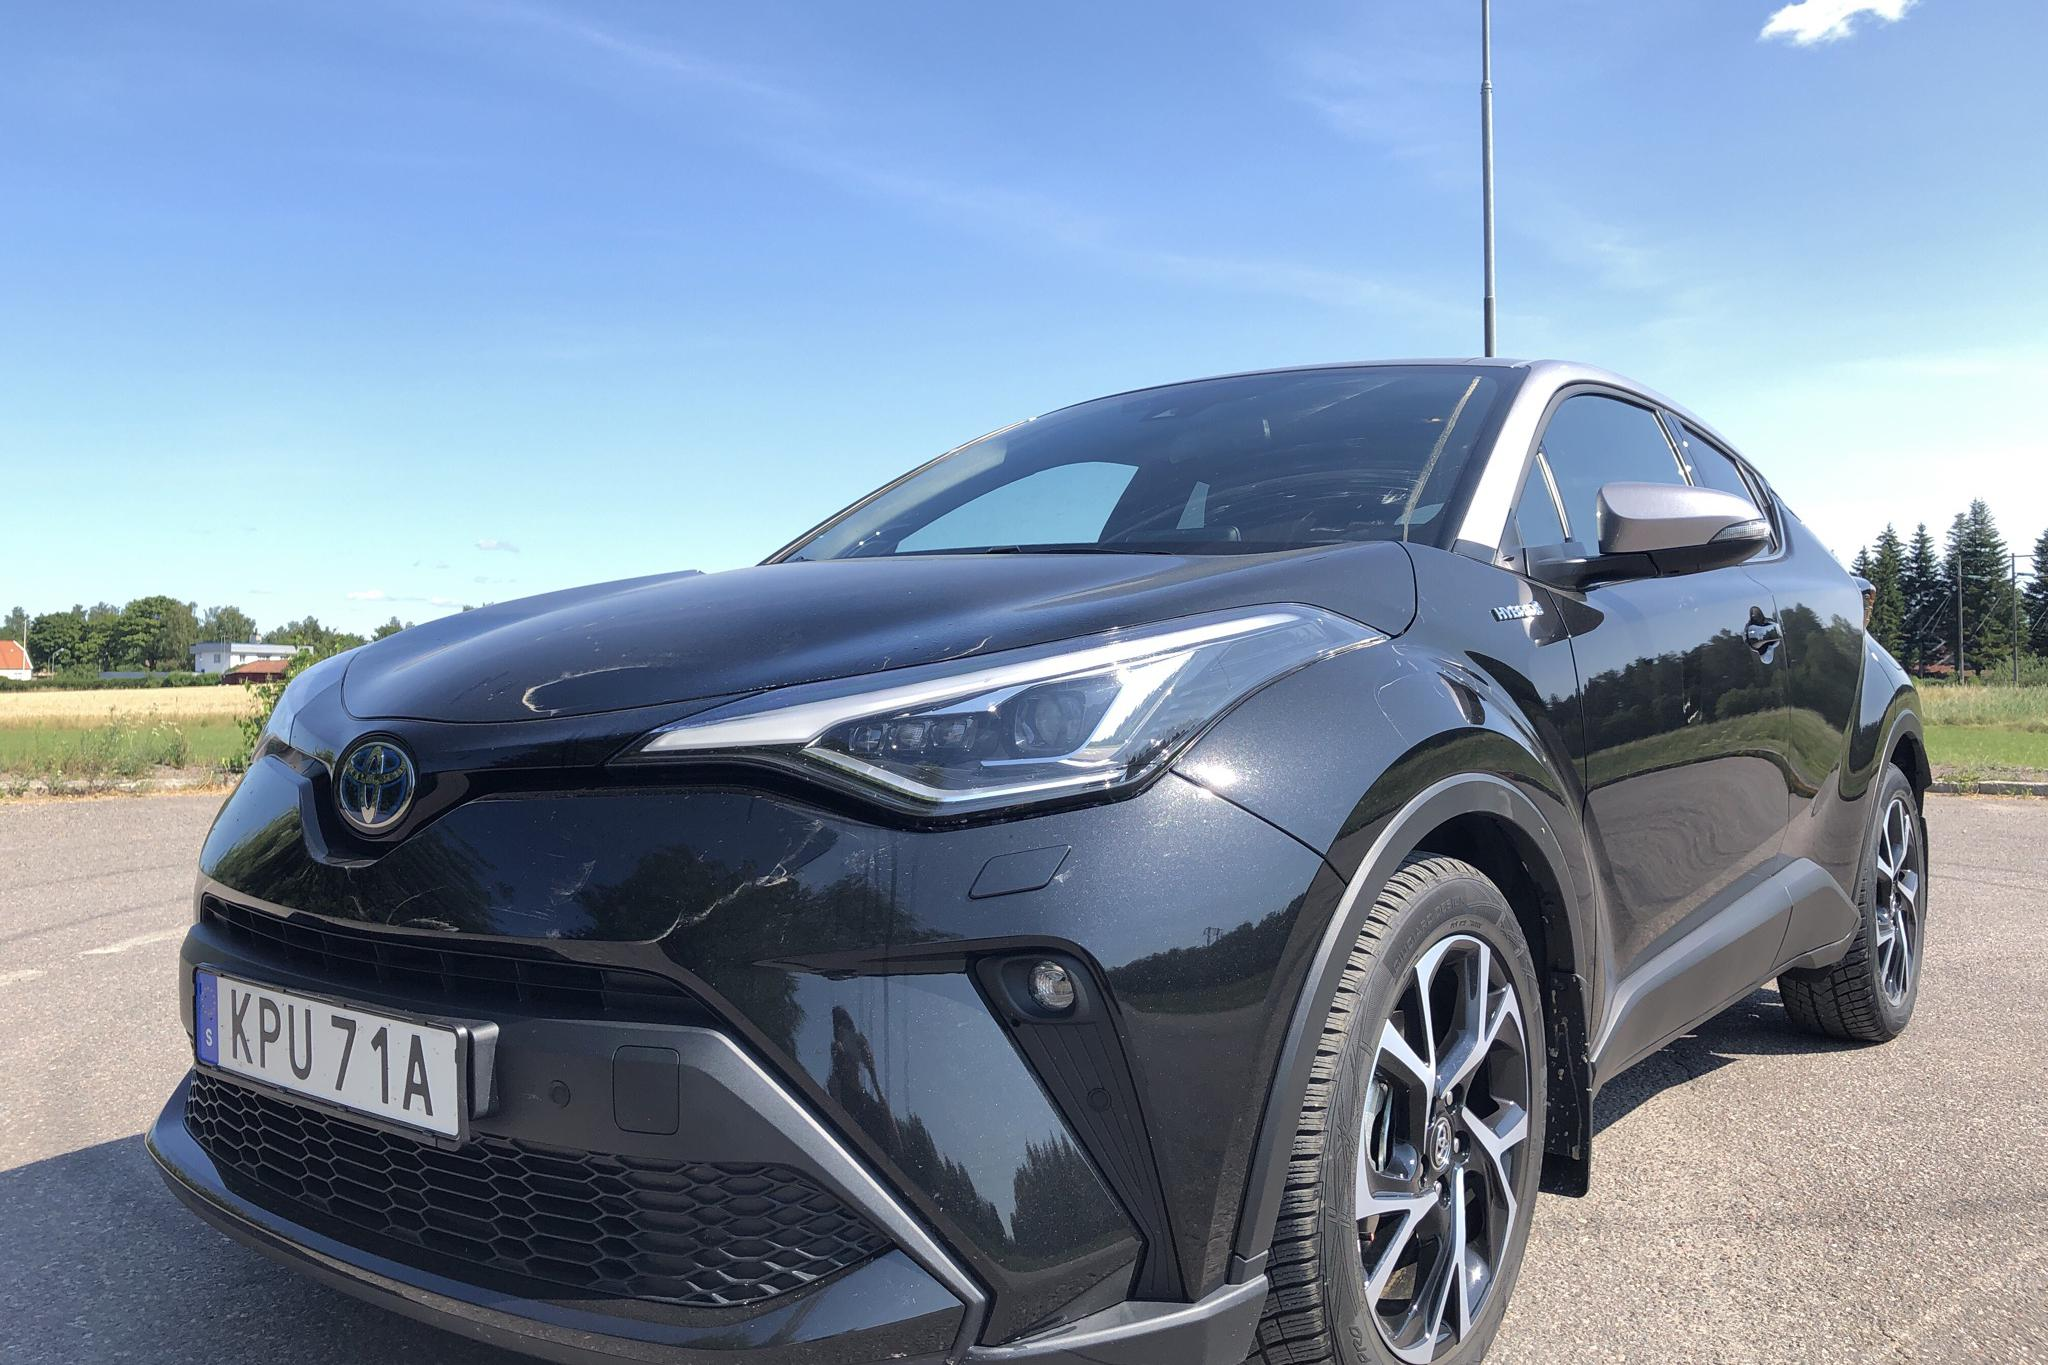 Toyota C-HR 1.8 HSD LCI (122hk) - 1 113 mil - Automat - svart - 2020